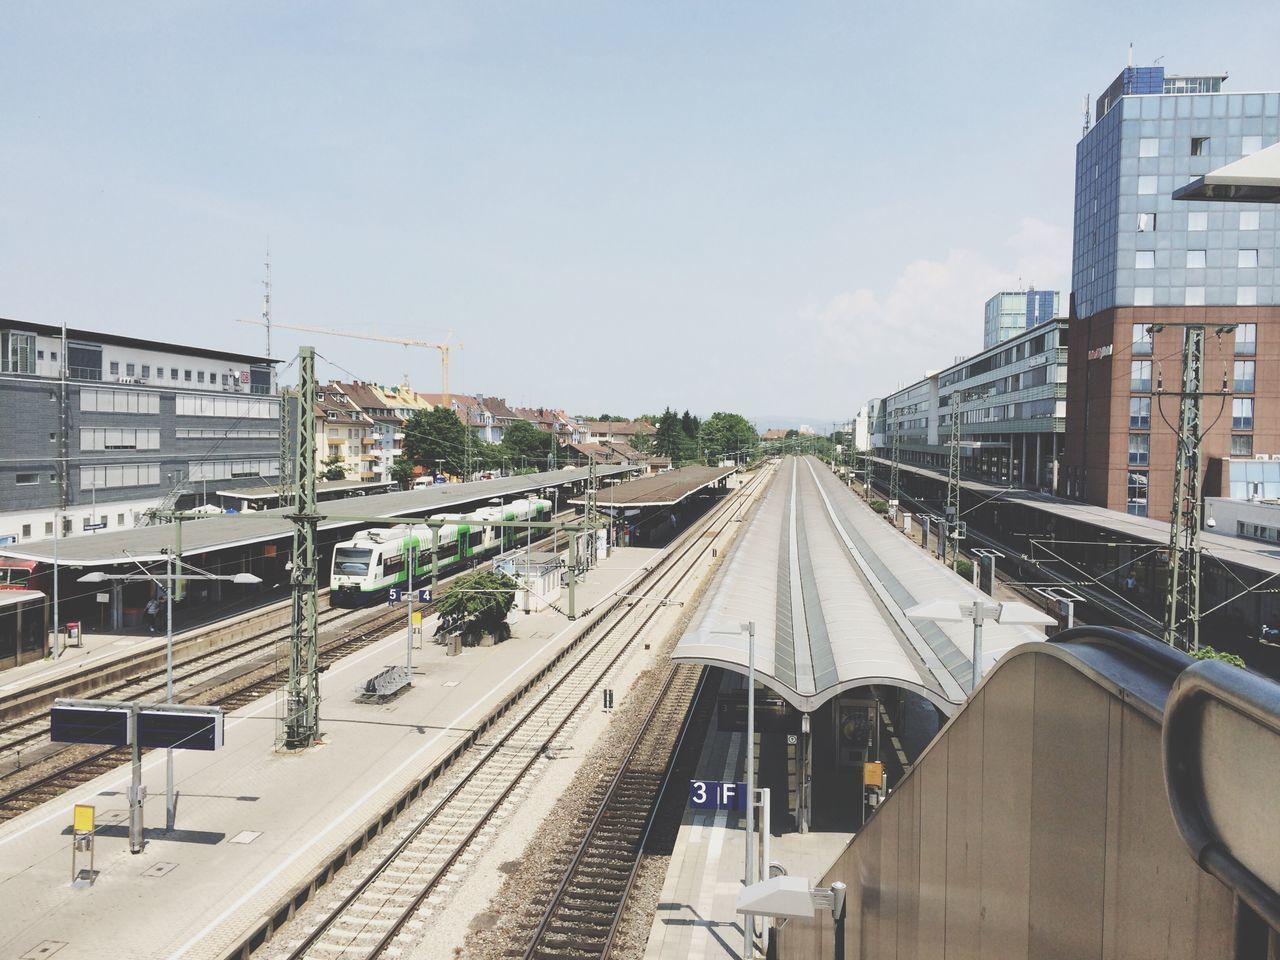 Beautiful stock photos of train, Architecture, Building Exterior, Built Structure, City